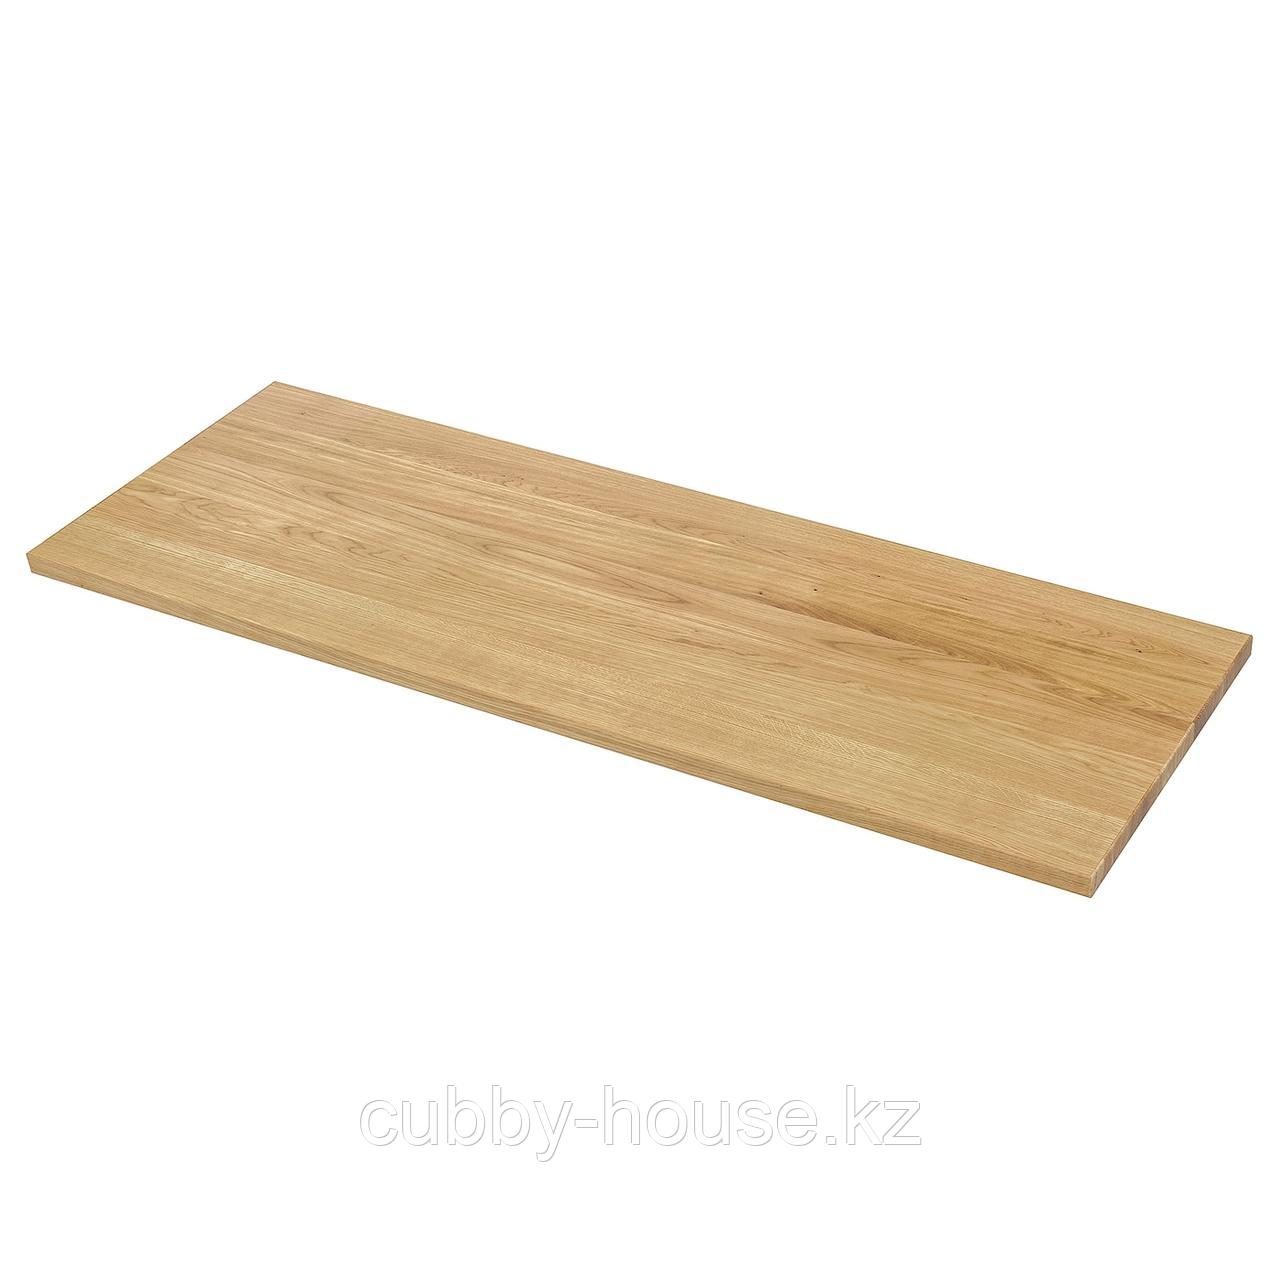 МЁЛЛЕКУЛЛА Столешница, дуб, шпон, 246x3.8 см